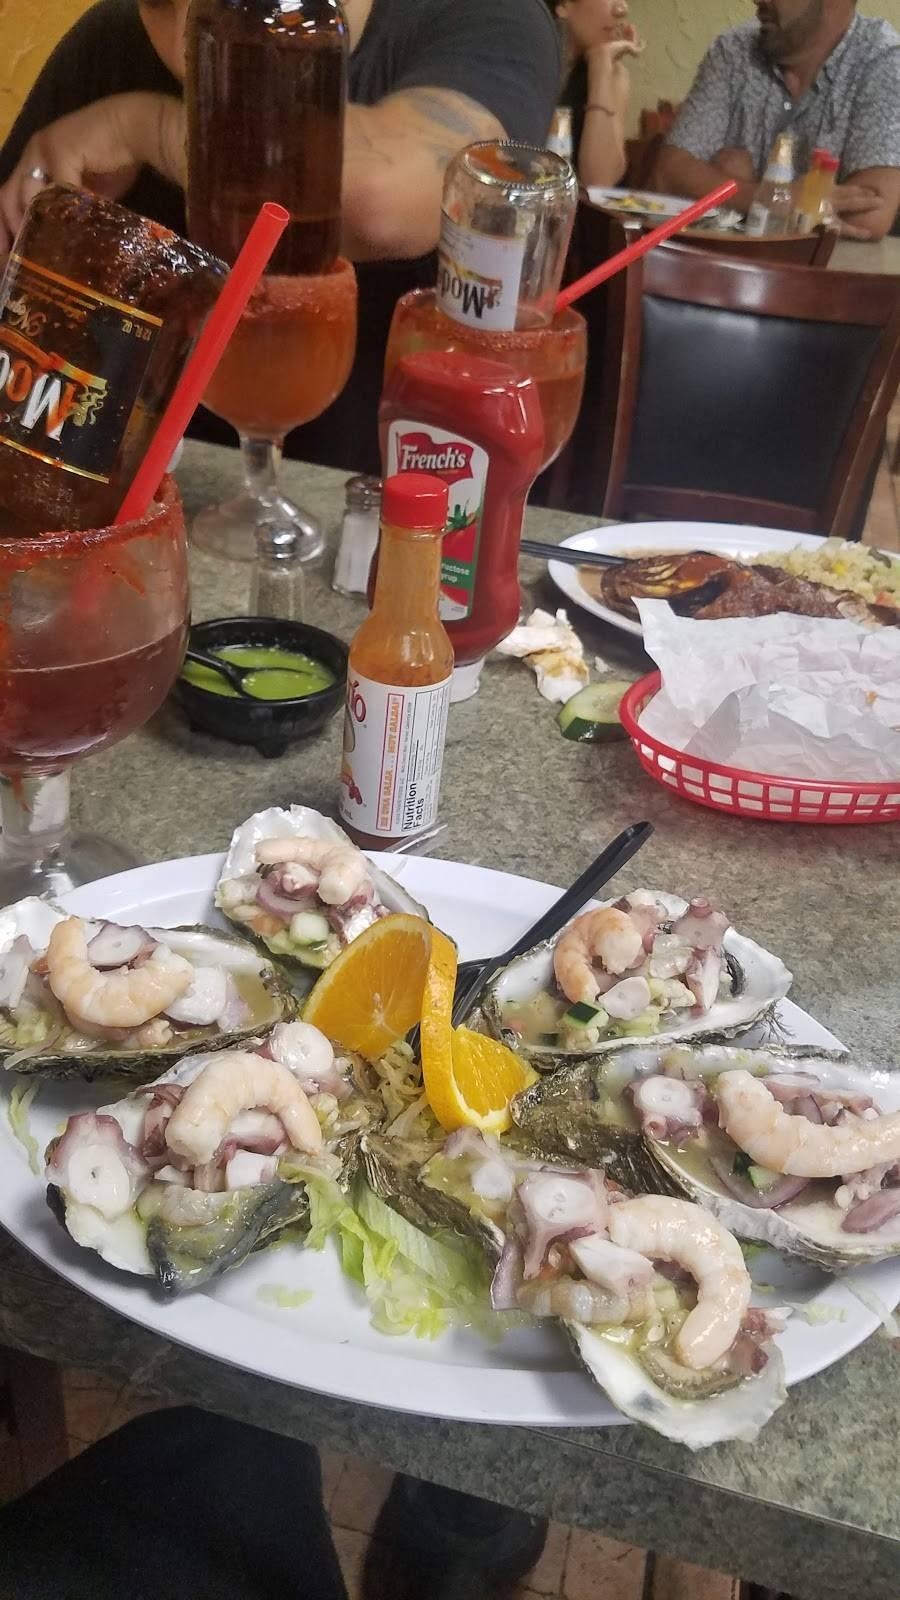 Mariscos Camarena | restaurant | 2055 Glenoaks Blvd, San Fernando, CA 91340, USA | 8186984237 OR +1 818-698-4237